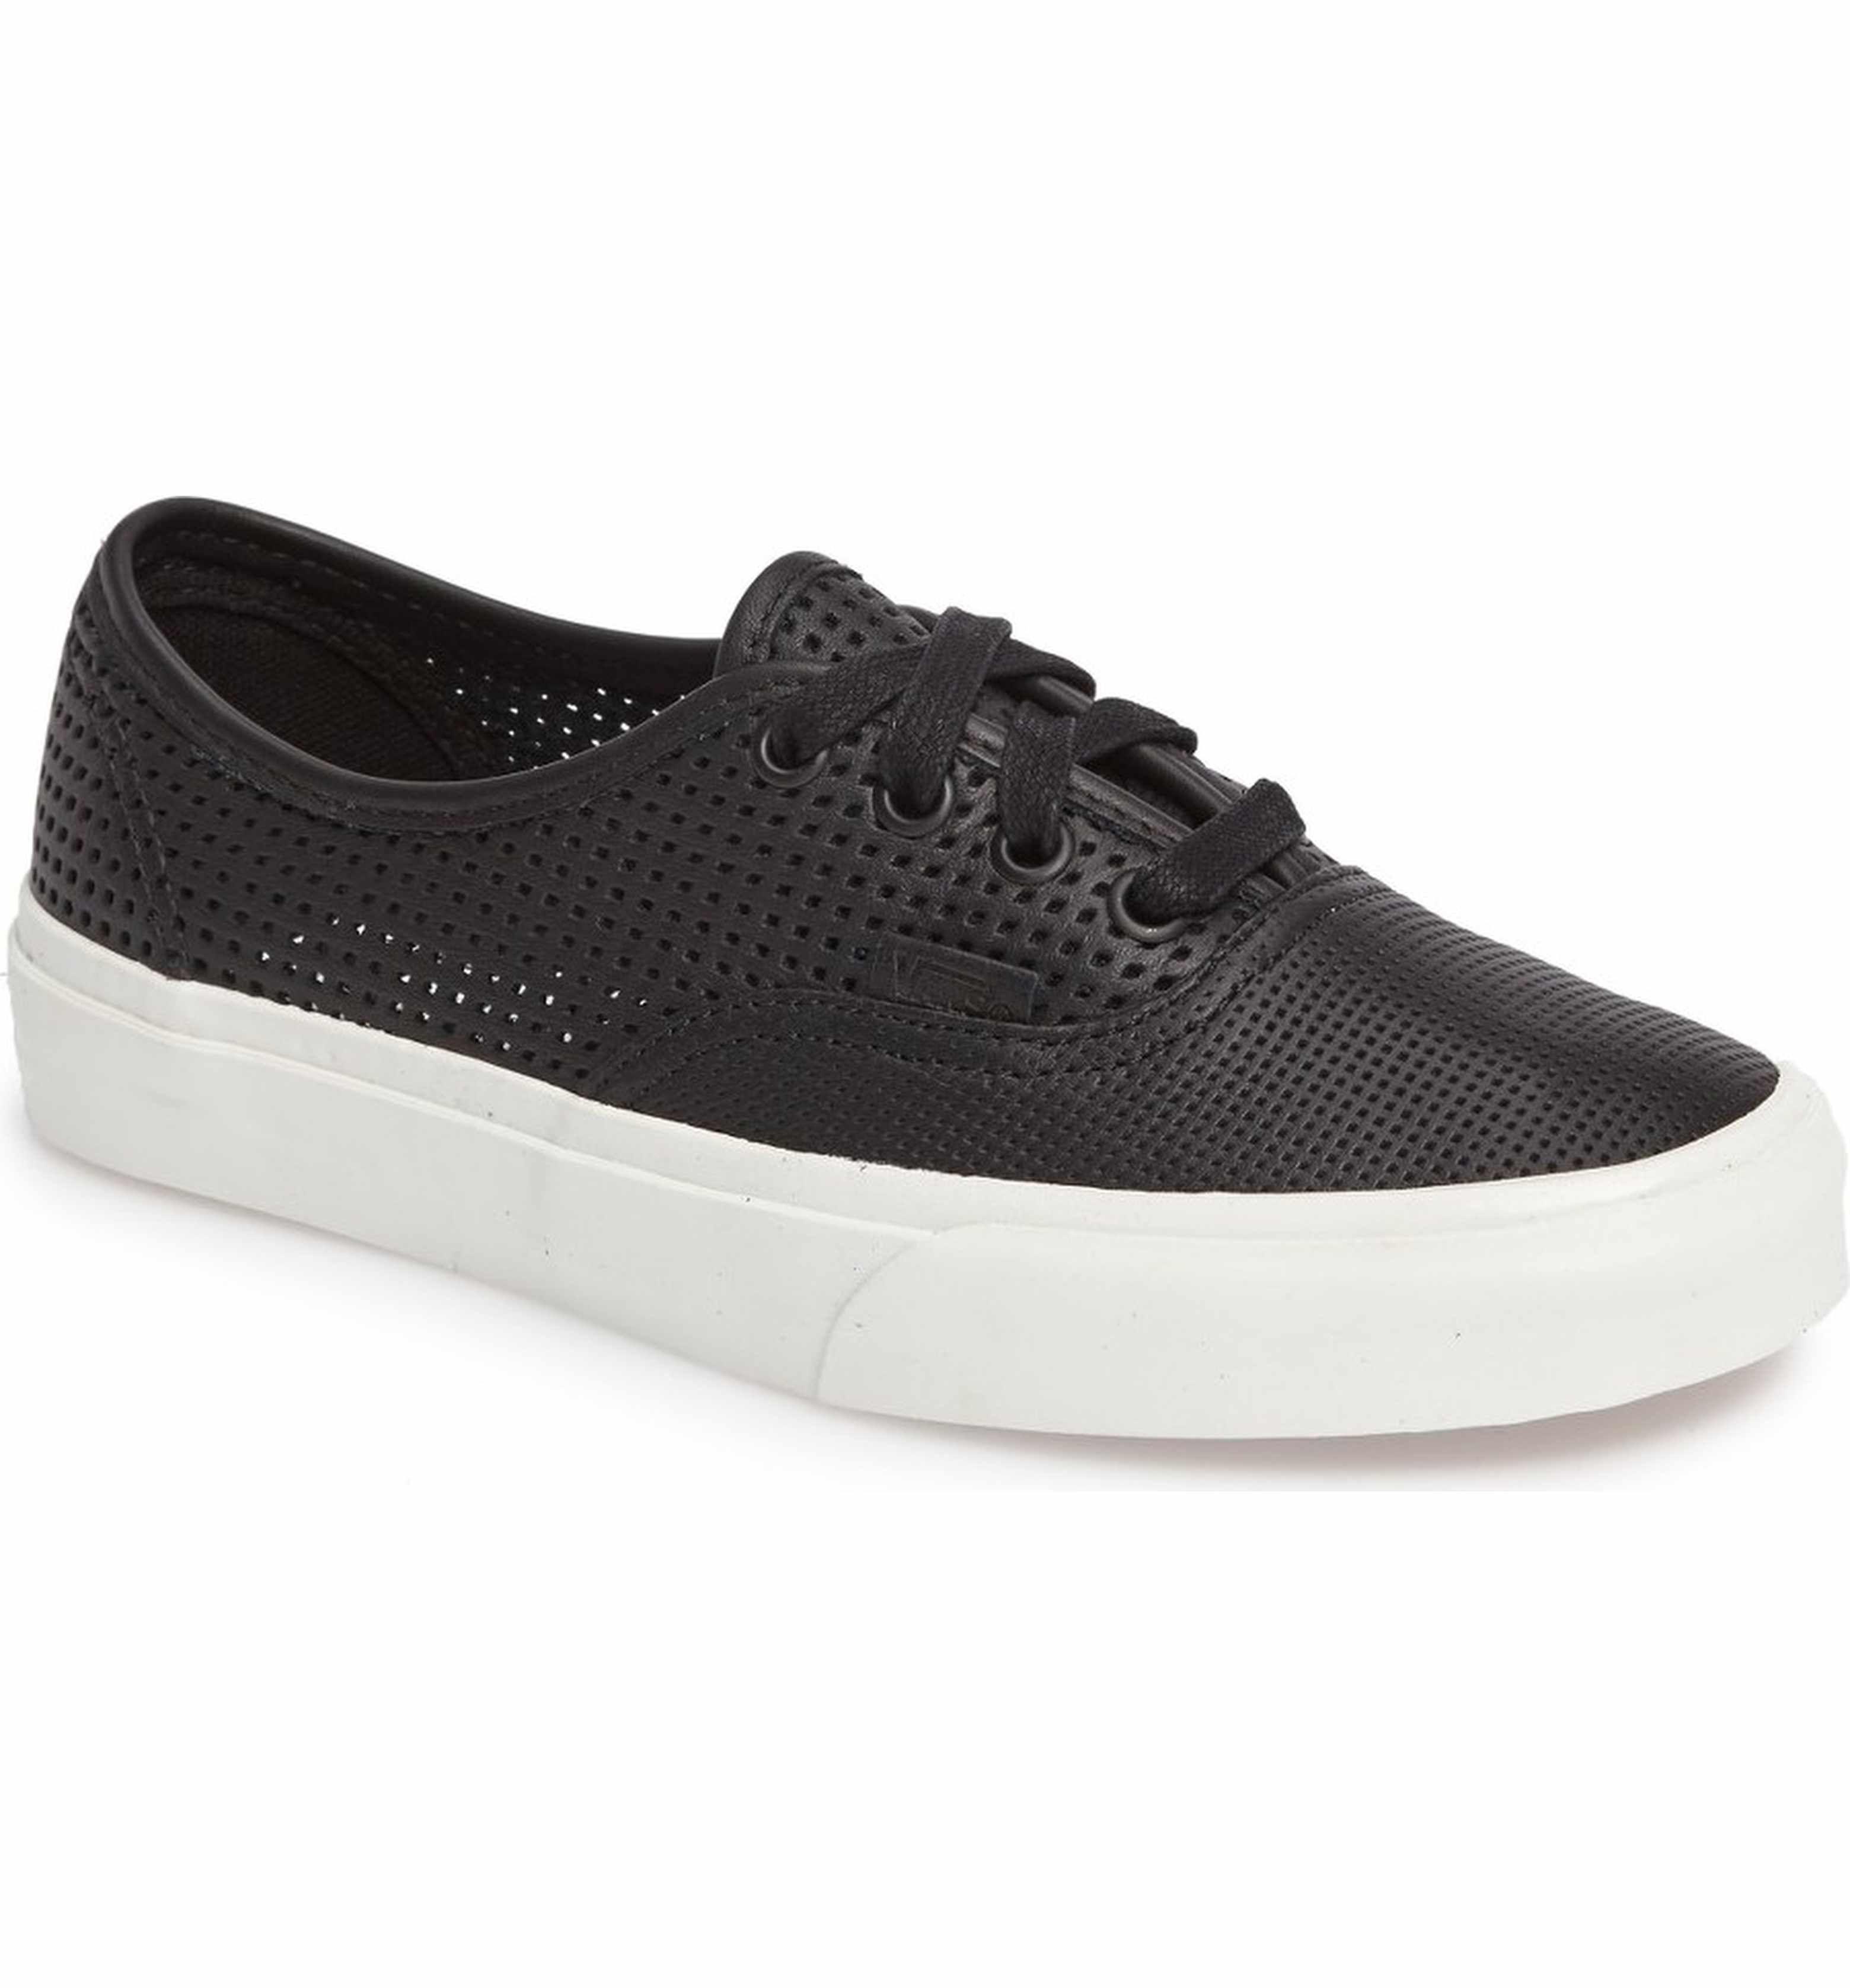 a6039bcb5eaf6d Main Image - Vans Authentic DX Perforated Sneaker (Women)